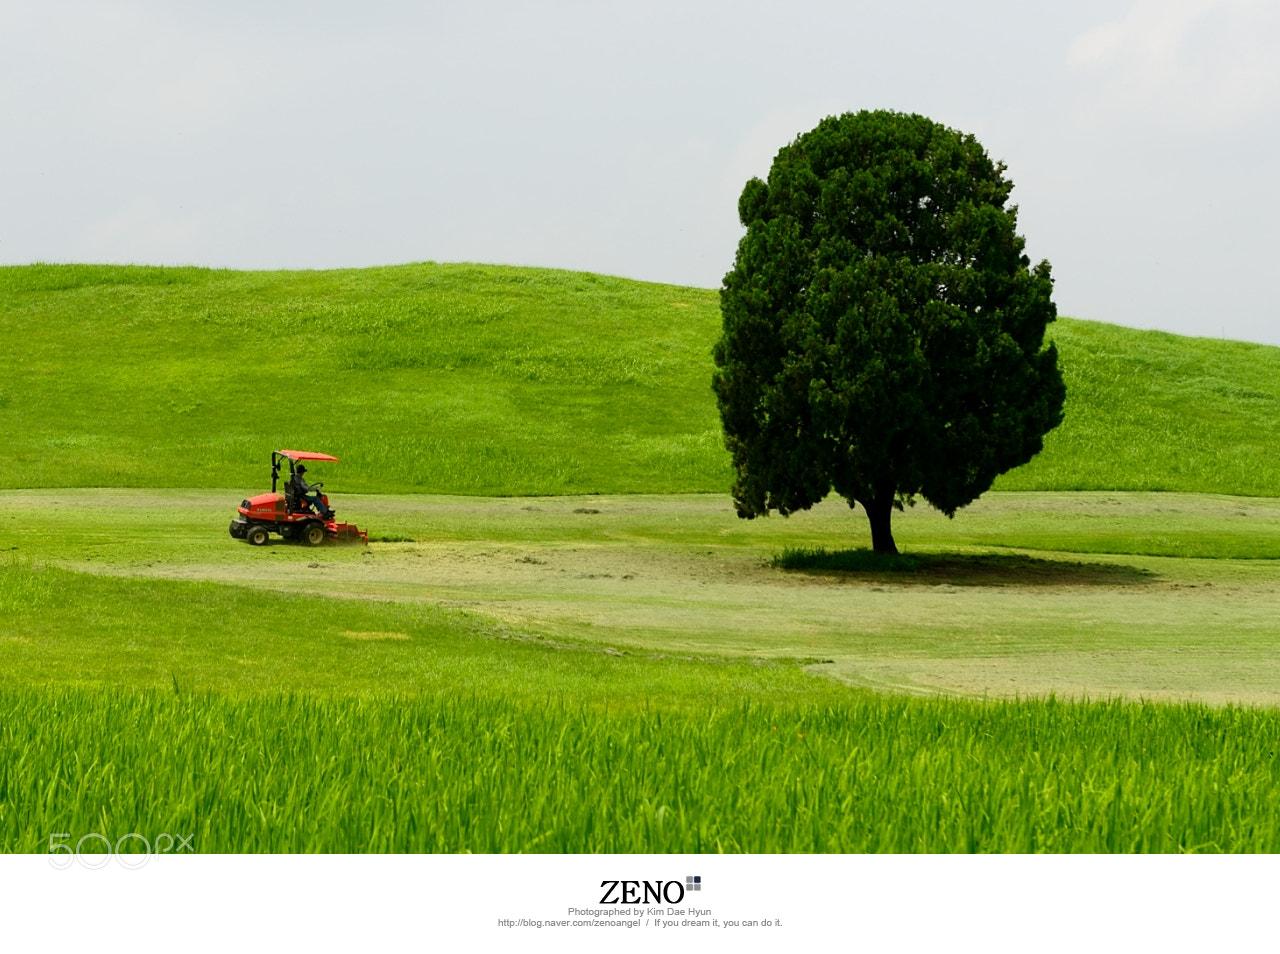 Photograph 서울 올림픽공원 외톨이 나무 by Kim DaeHyun on 500px